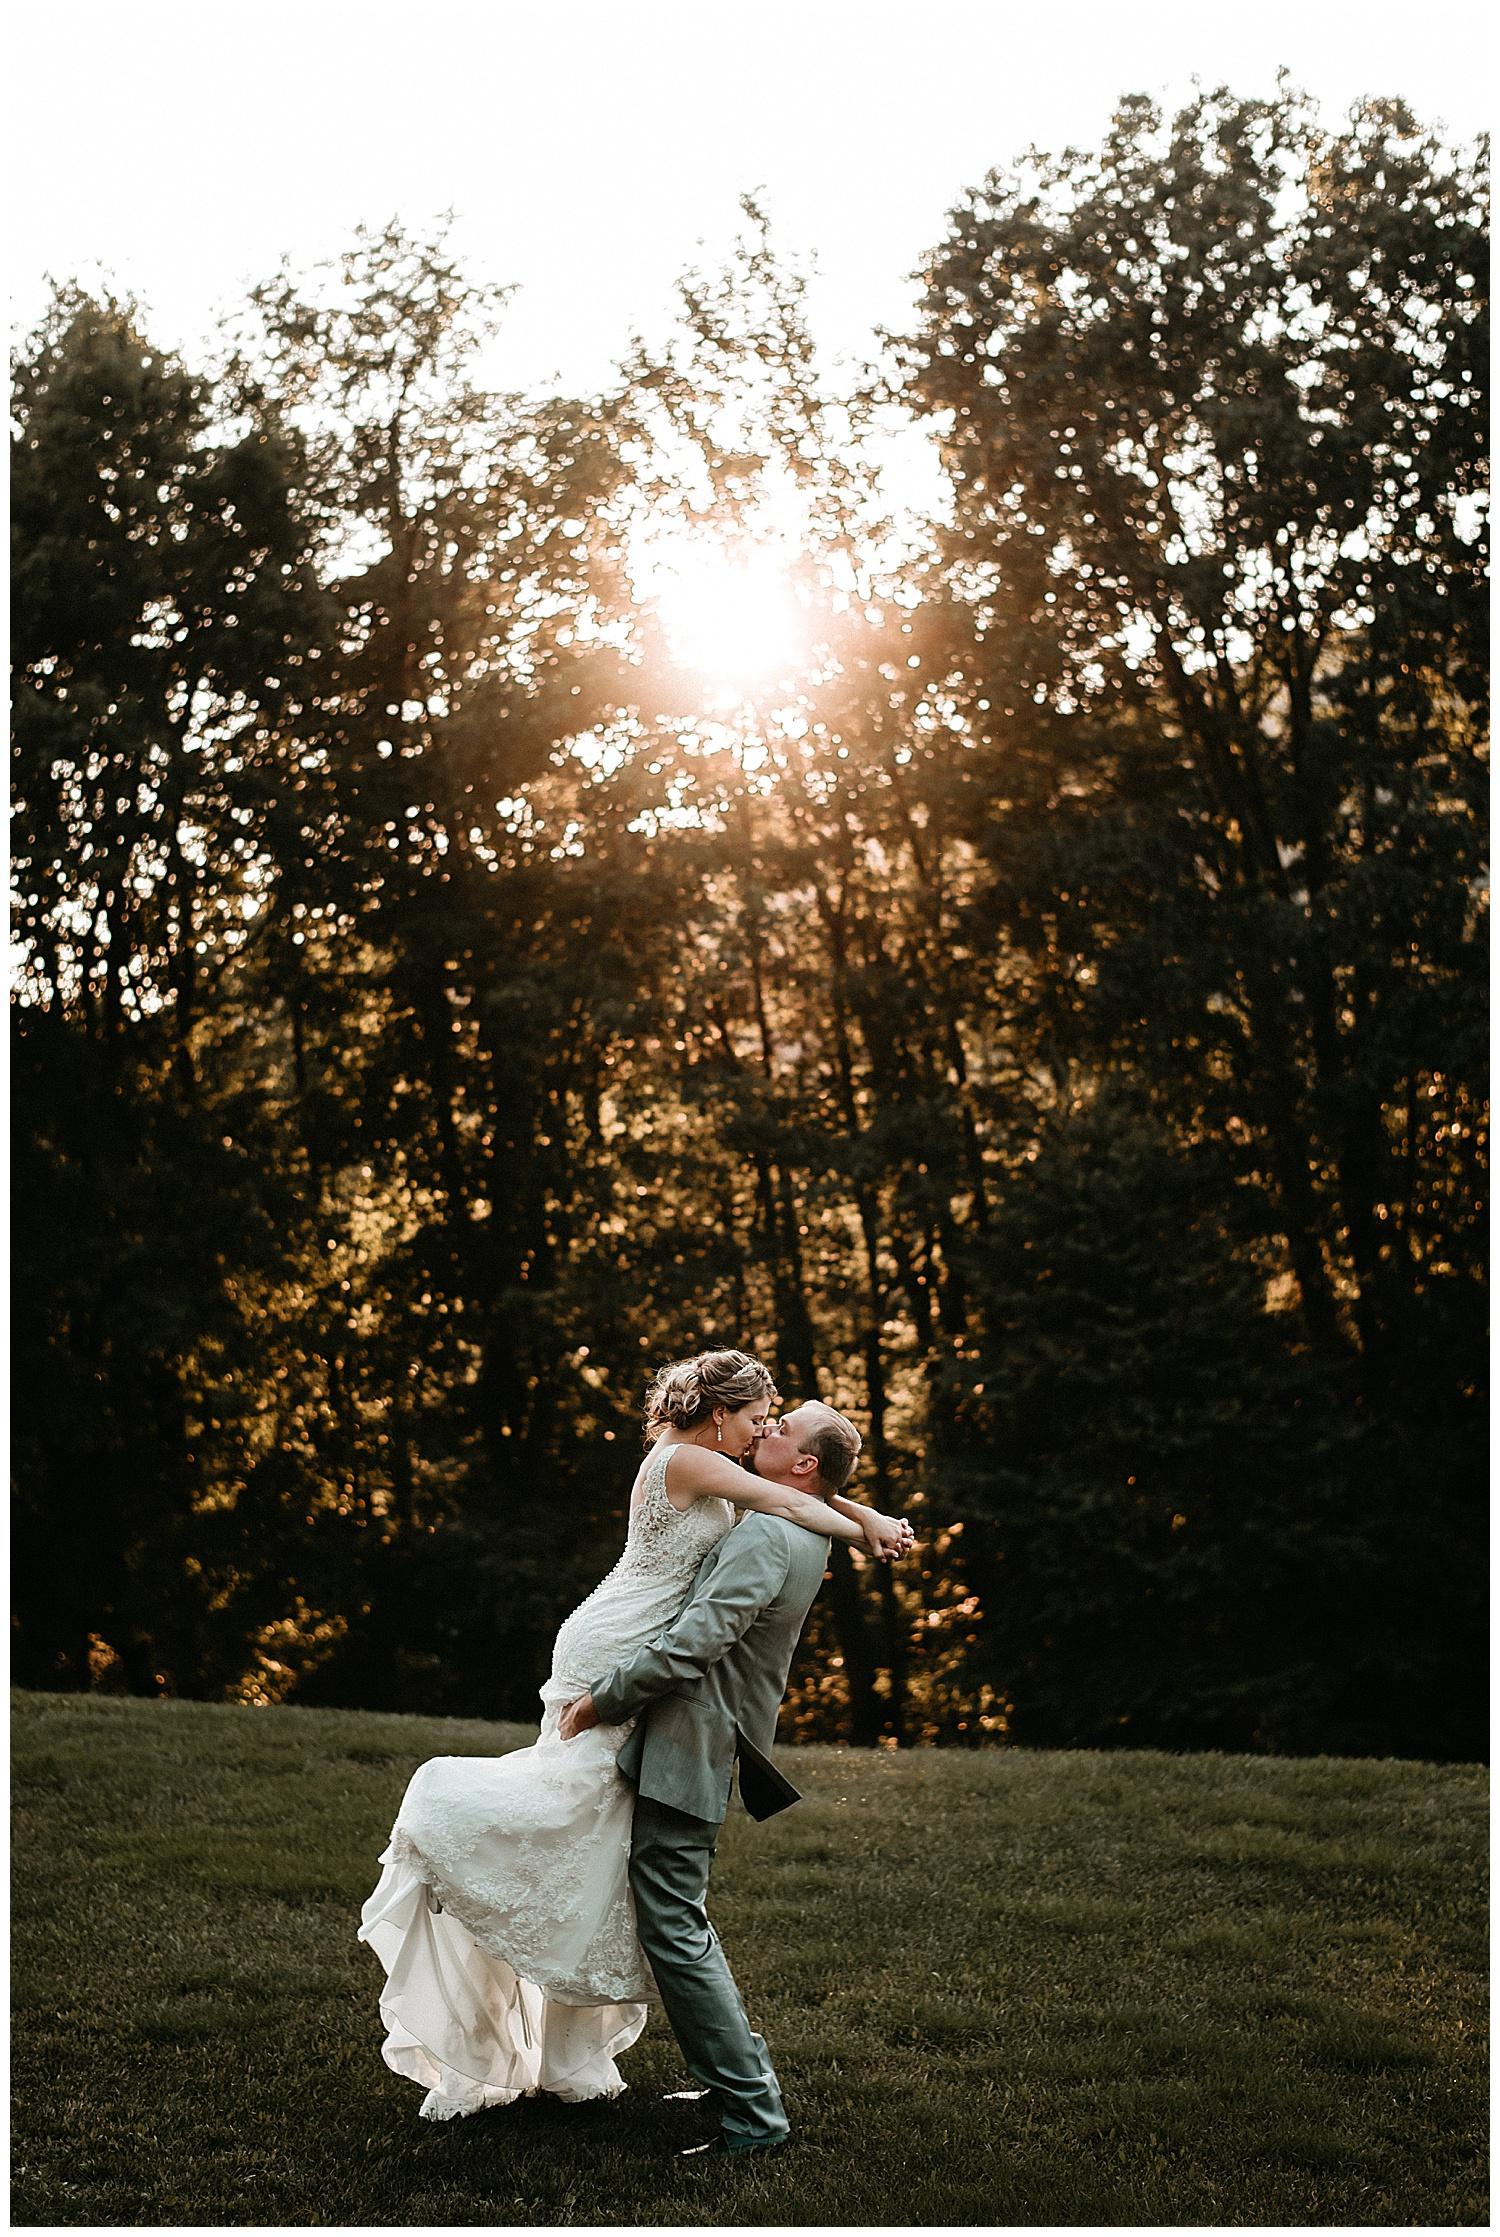 NEPA-Lehigh-Valley-Wedding-Photographer-at-Fountain-Springs-Country-Inn-Ashland-PA_0058.jpg